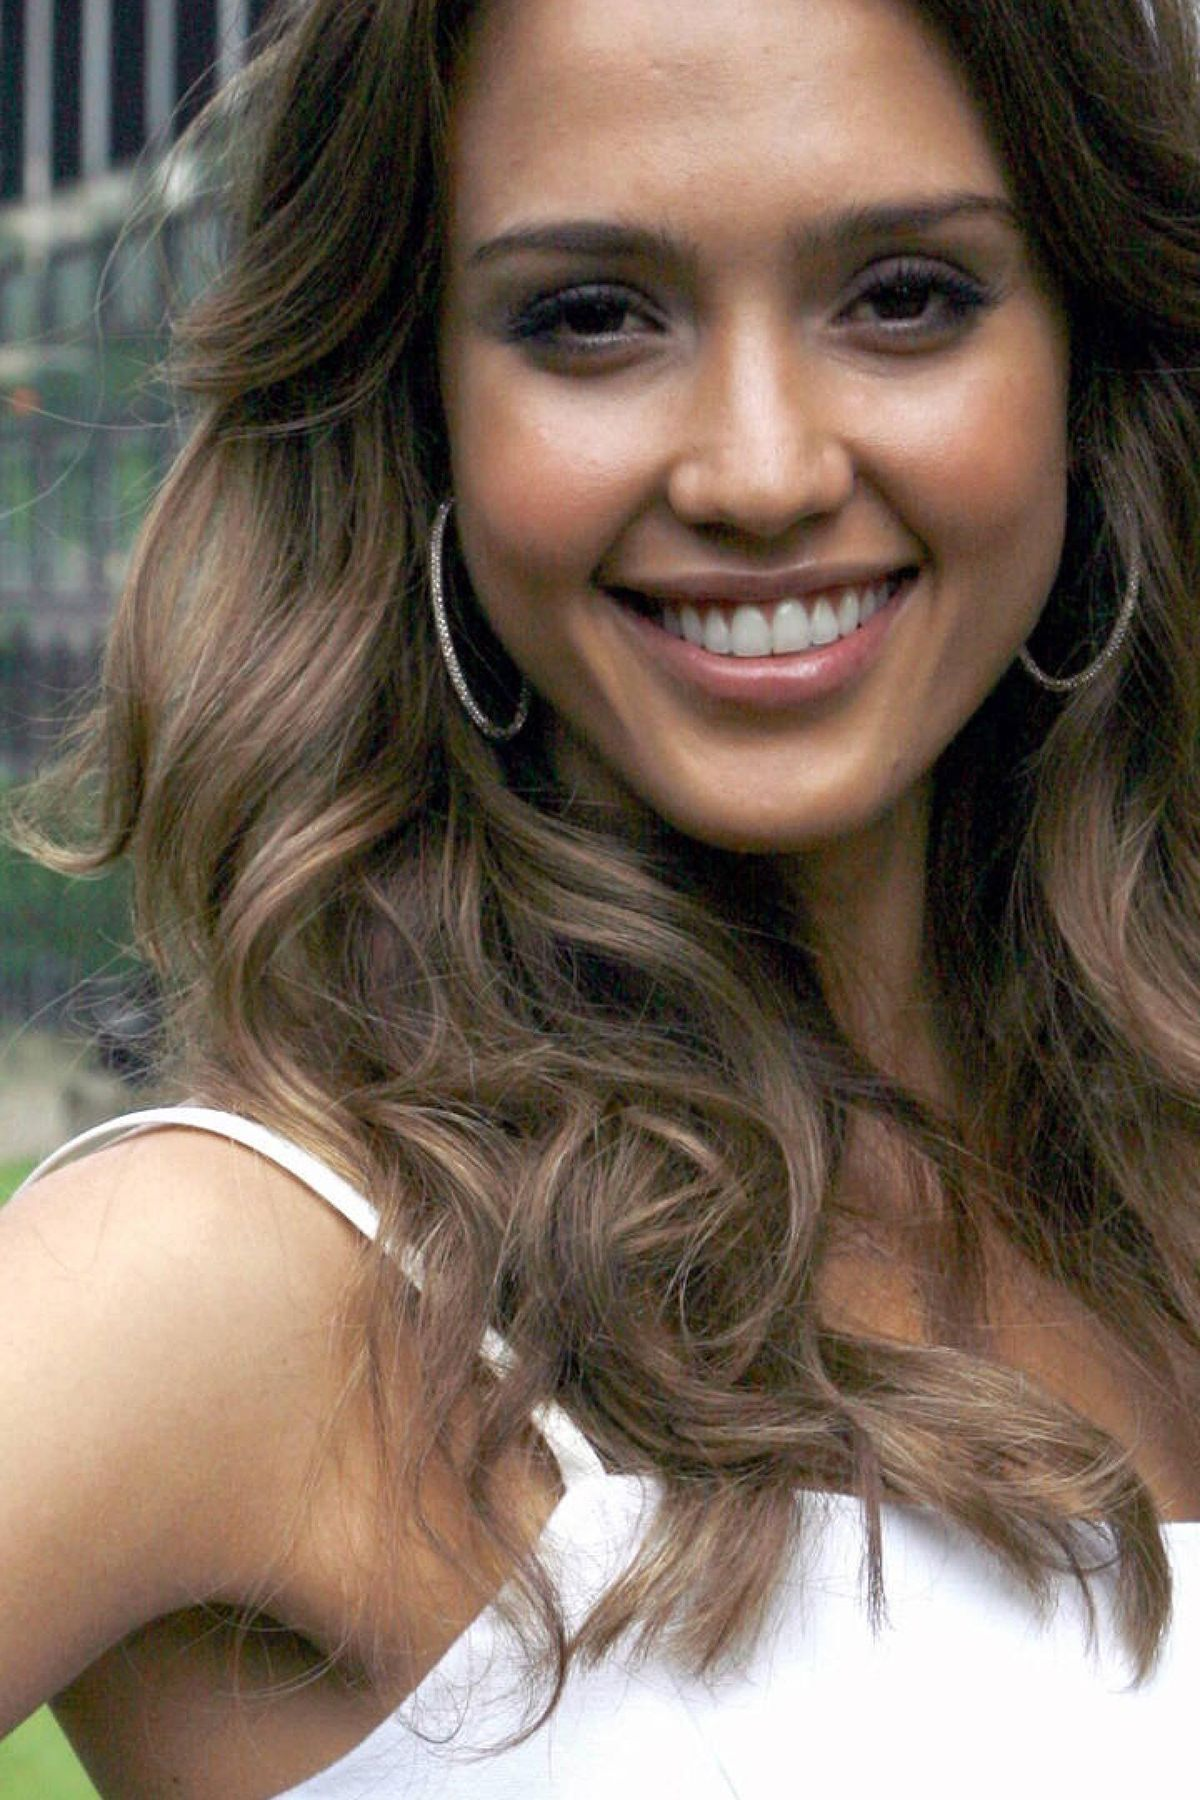 Beautiful Cute Smile Of Jessica Alba Mobile Wallpaper With Images Jessica Alba Mobile Wallpaper Jessica